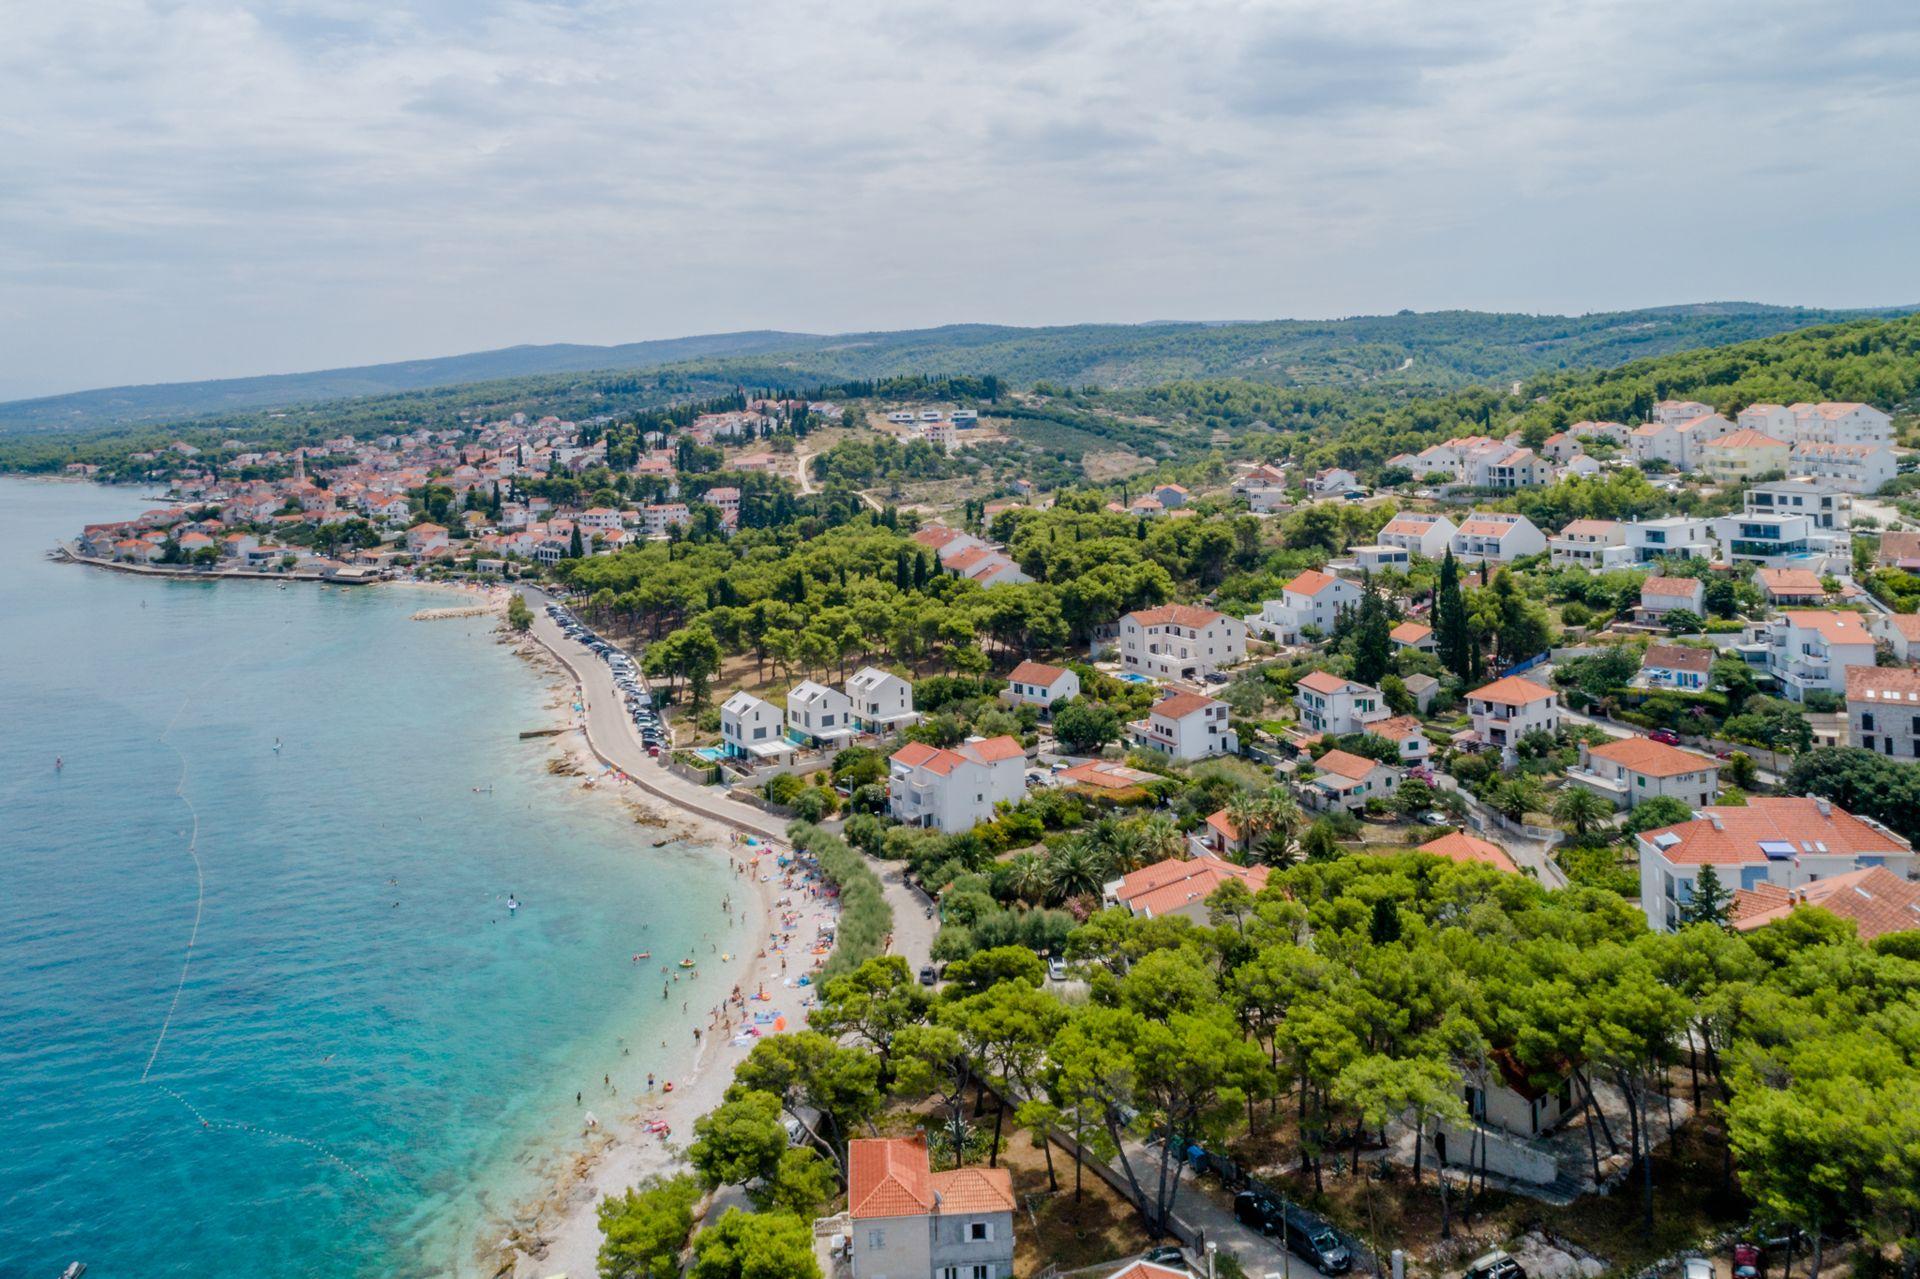 Sutivan Island Brac Croatia from the air